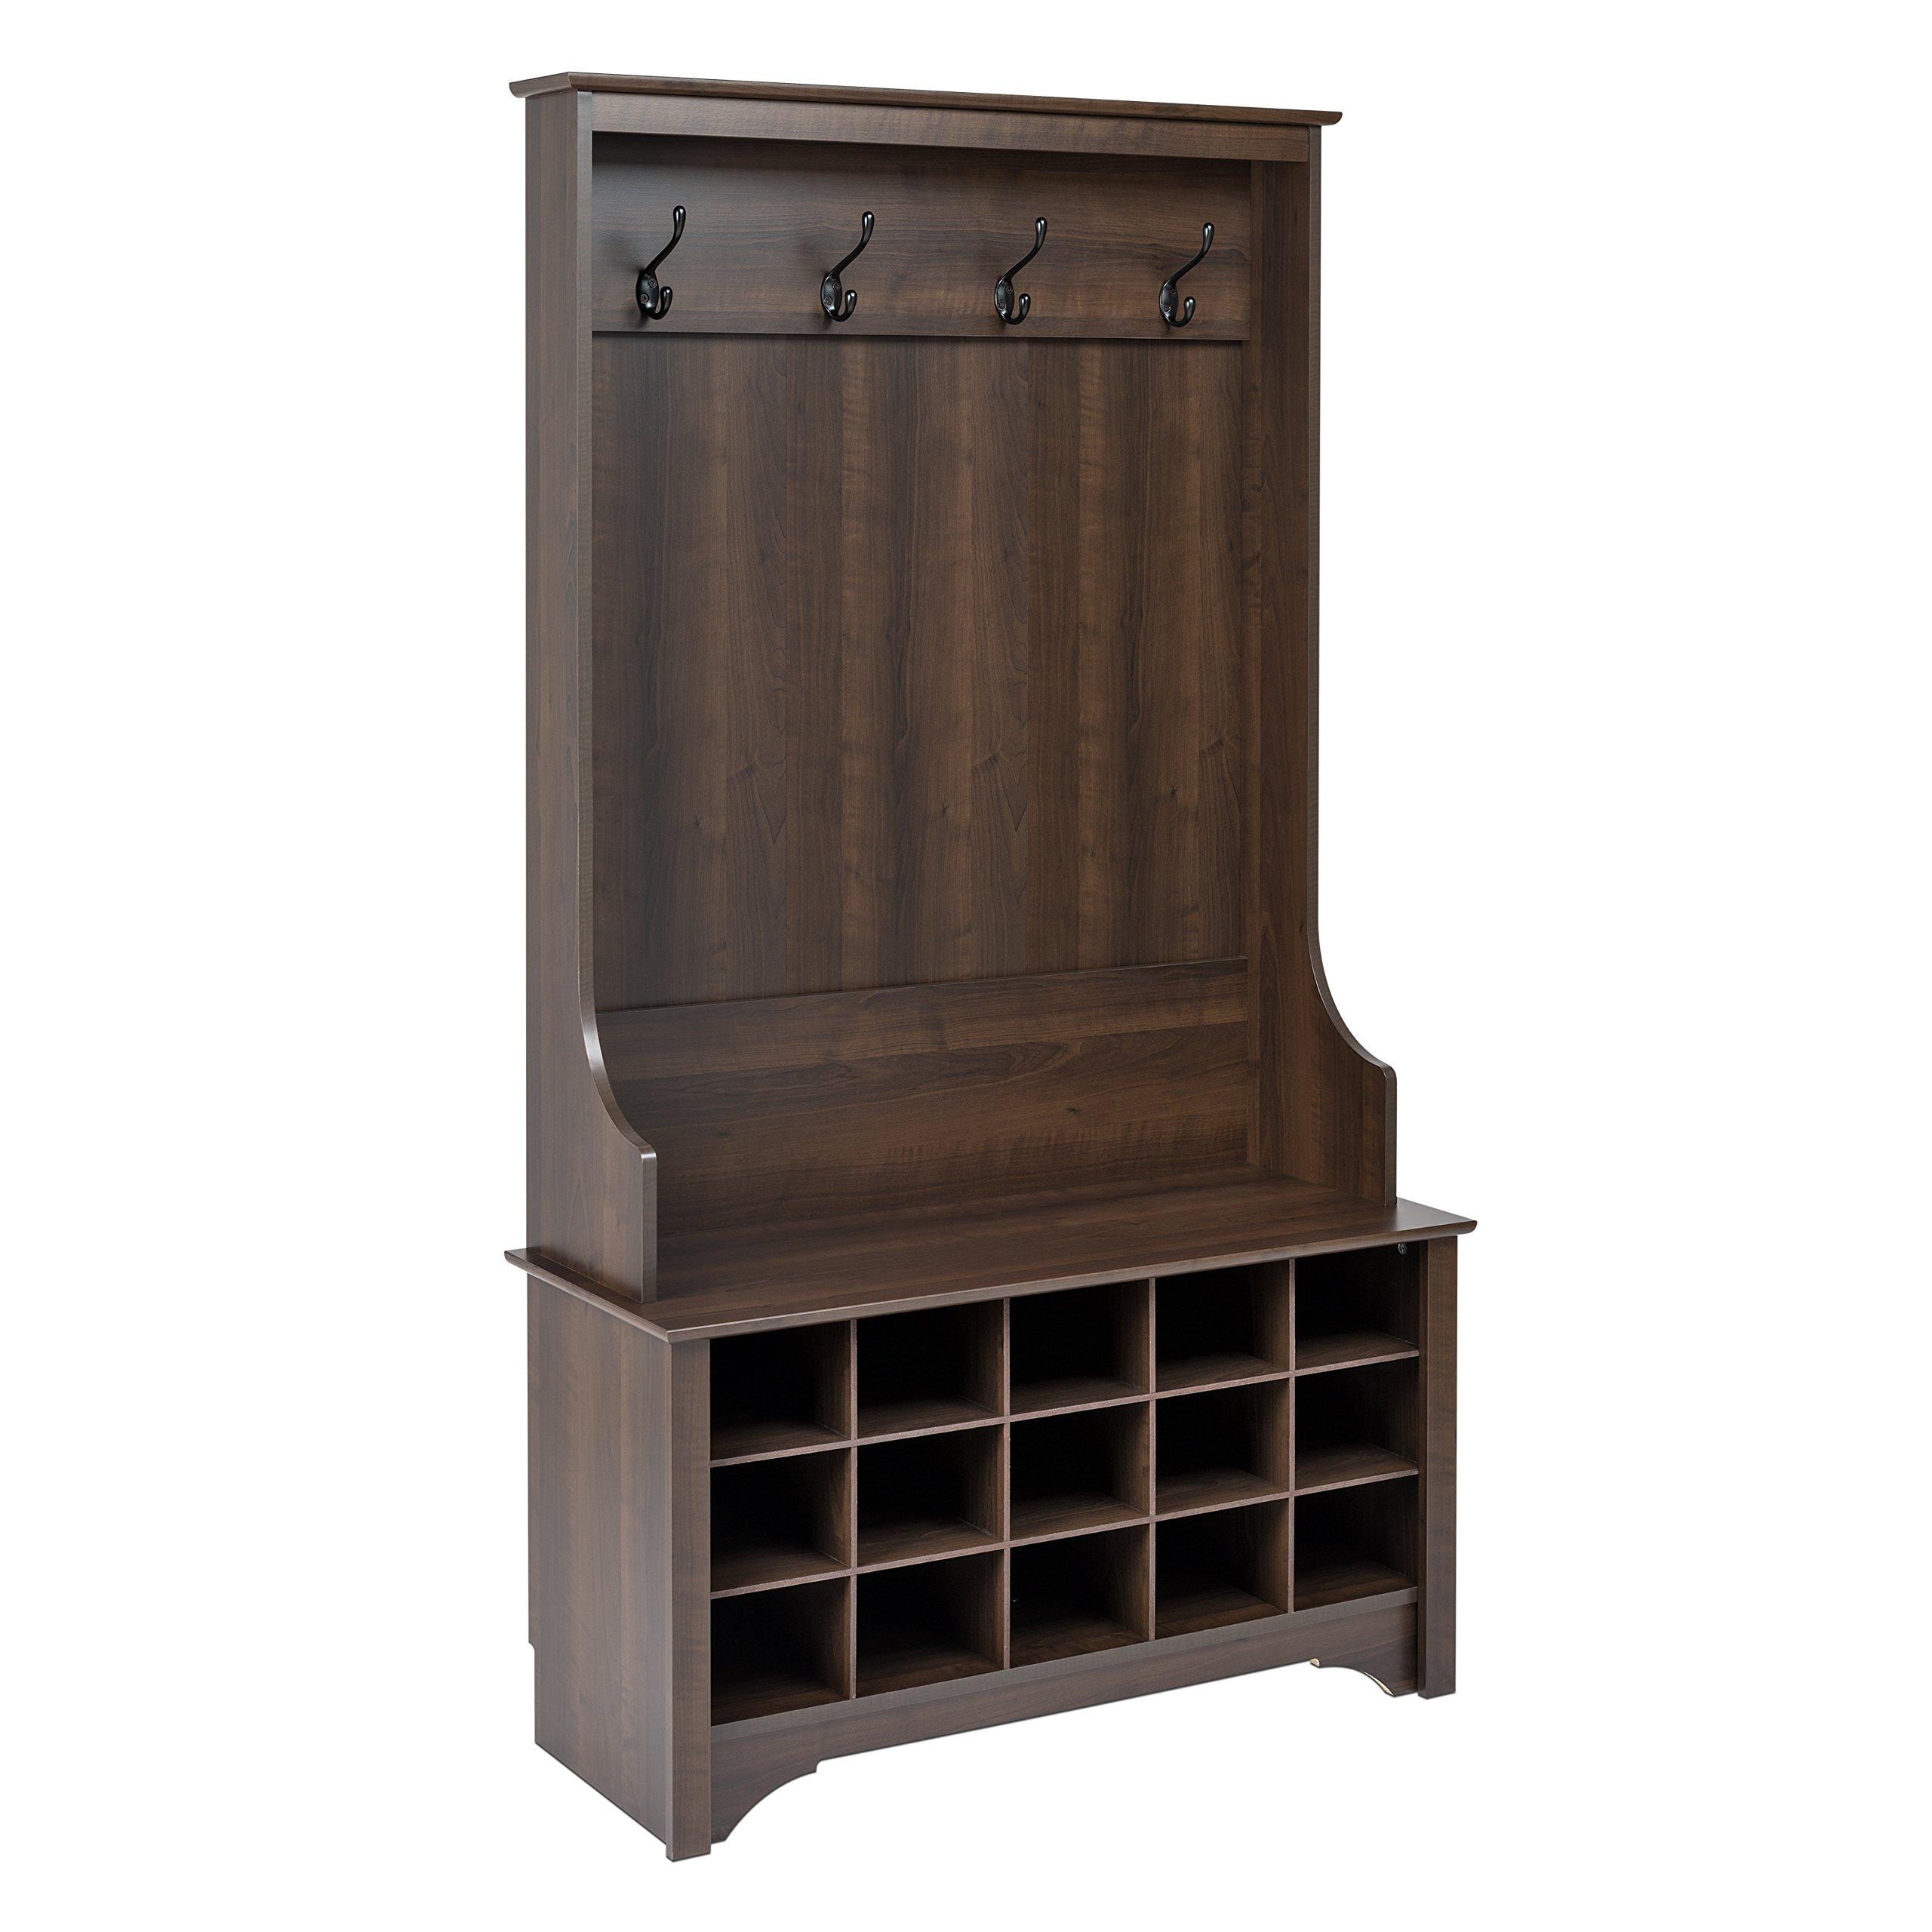 Retail Store Storage Furniture Design Of Mud Australia: Hall Tree With Shoe Storage Hanger Bench Mud Room Cabinets